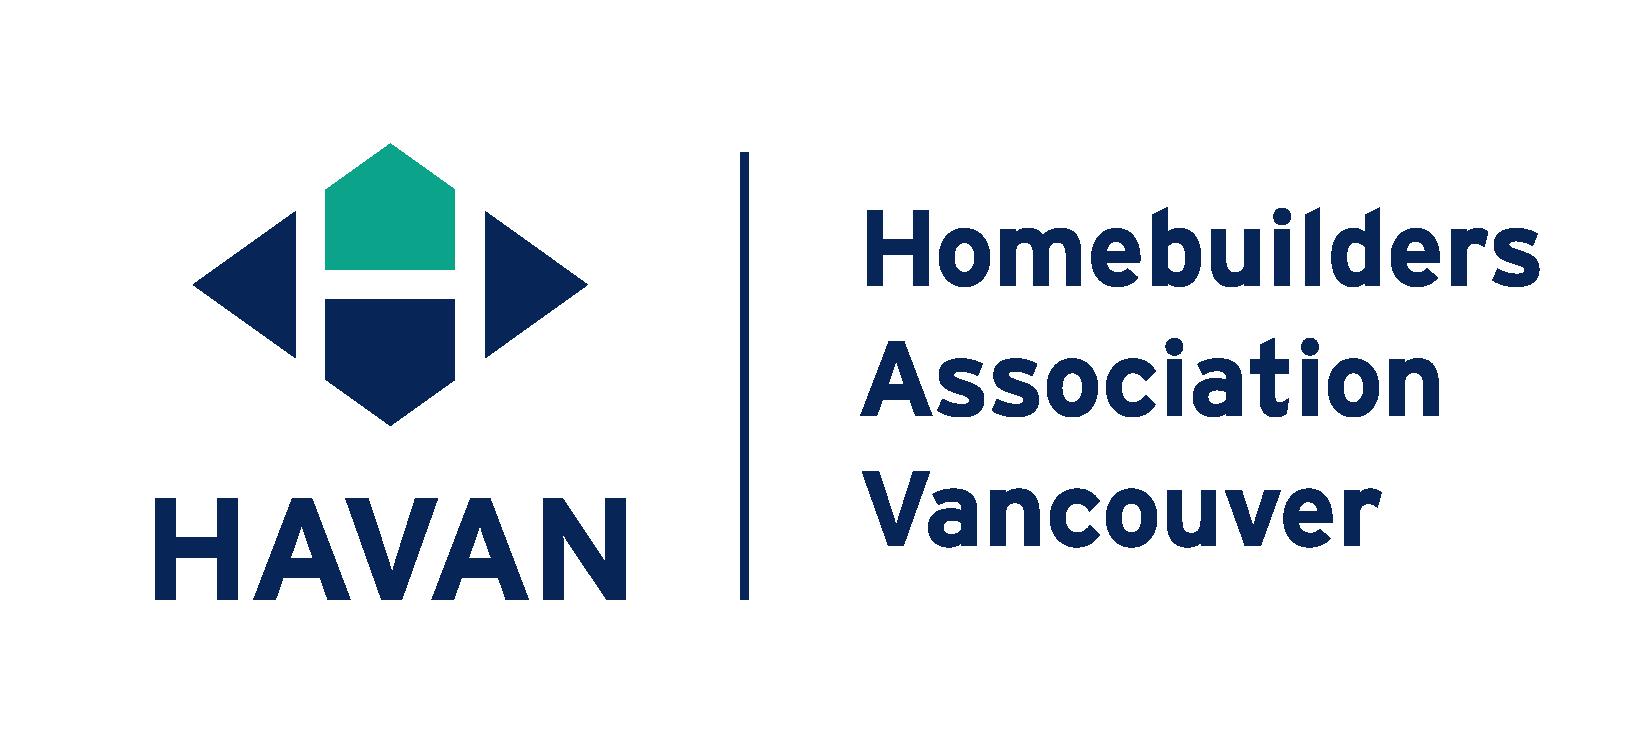 Homebuilders Association Vancouver HAVAN